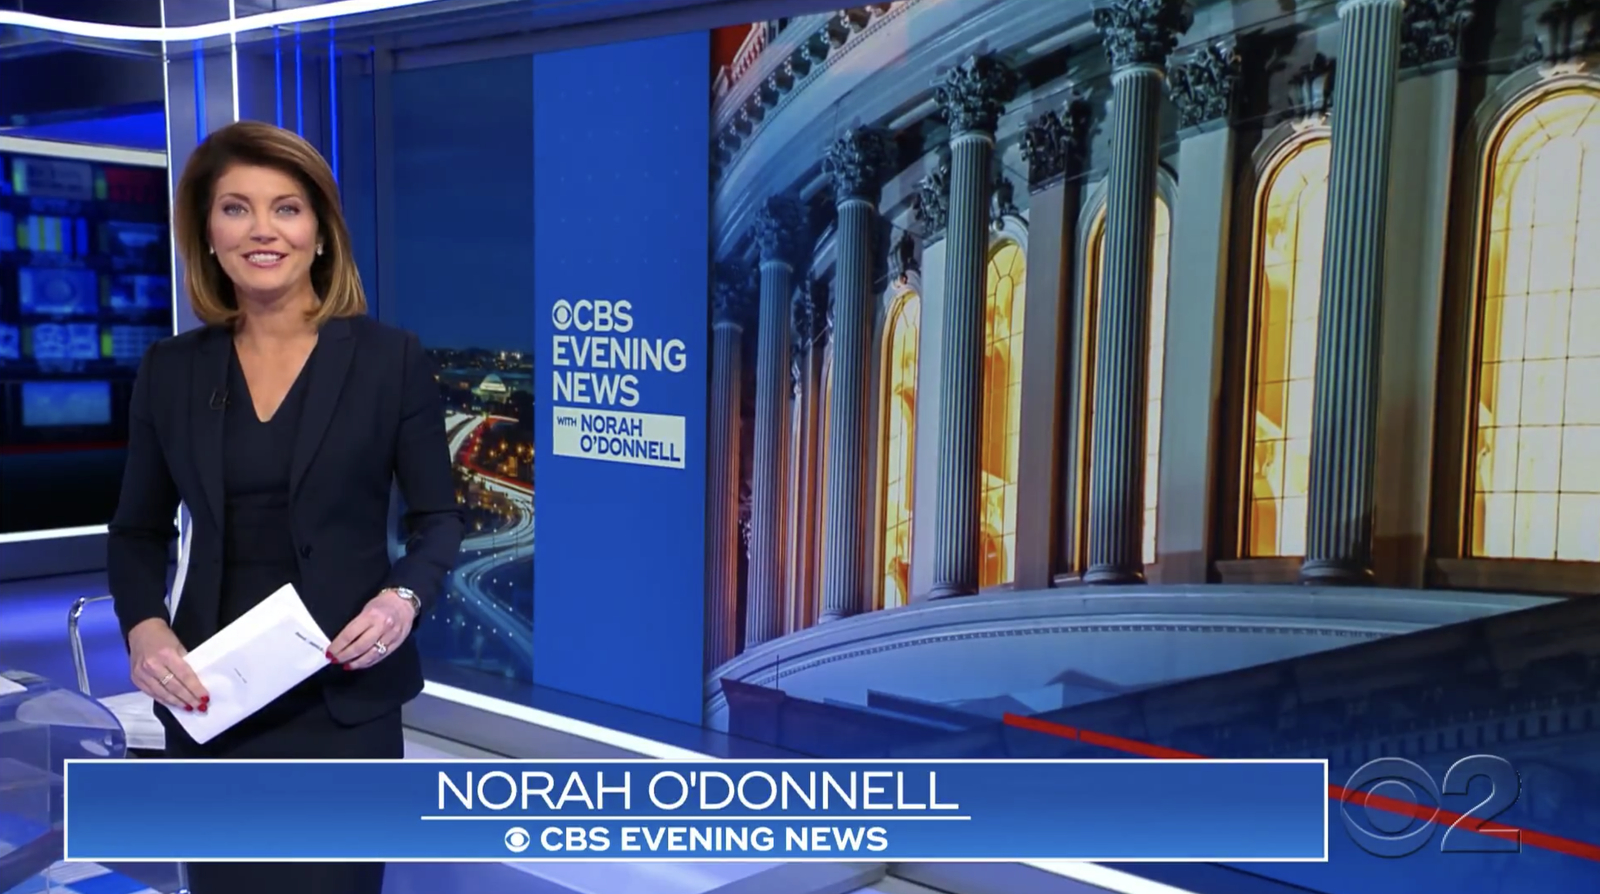 NCS_CBS-Evening-News_Motion-Design_Washington_010